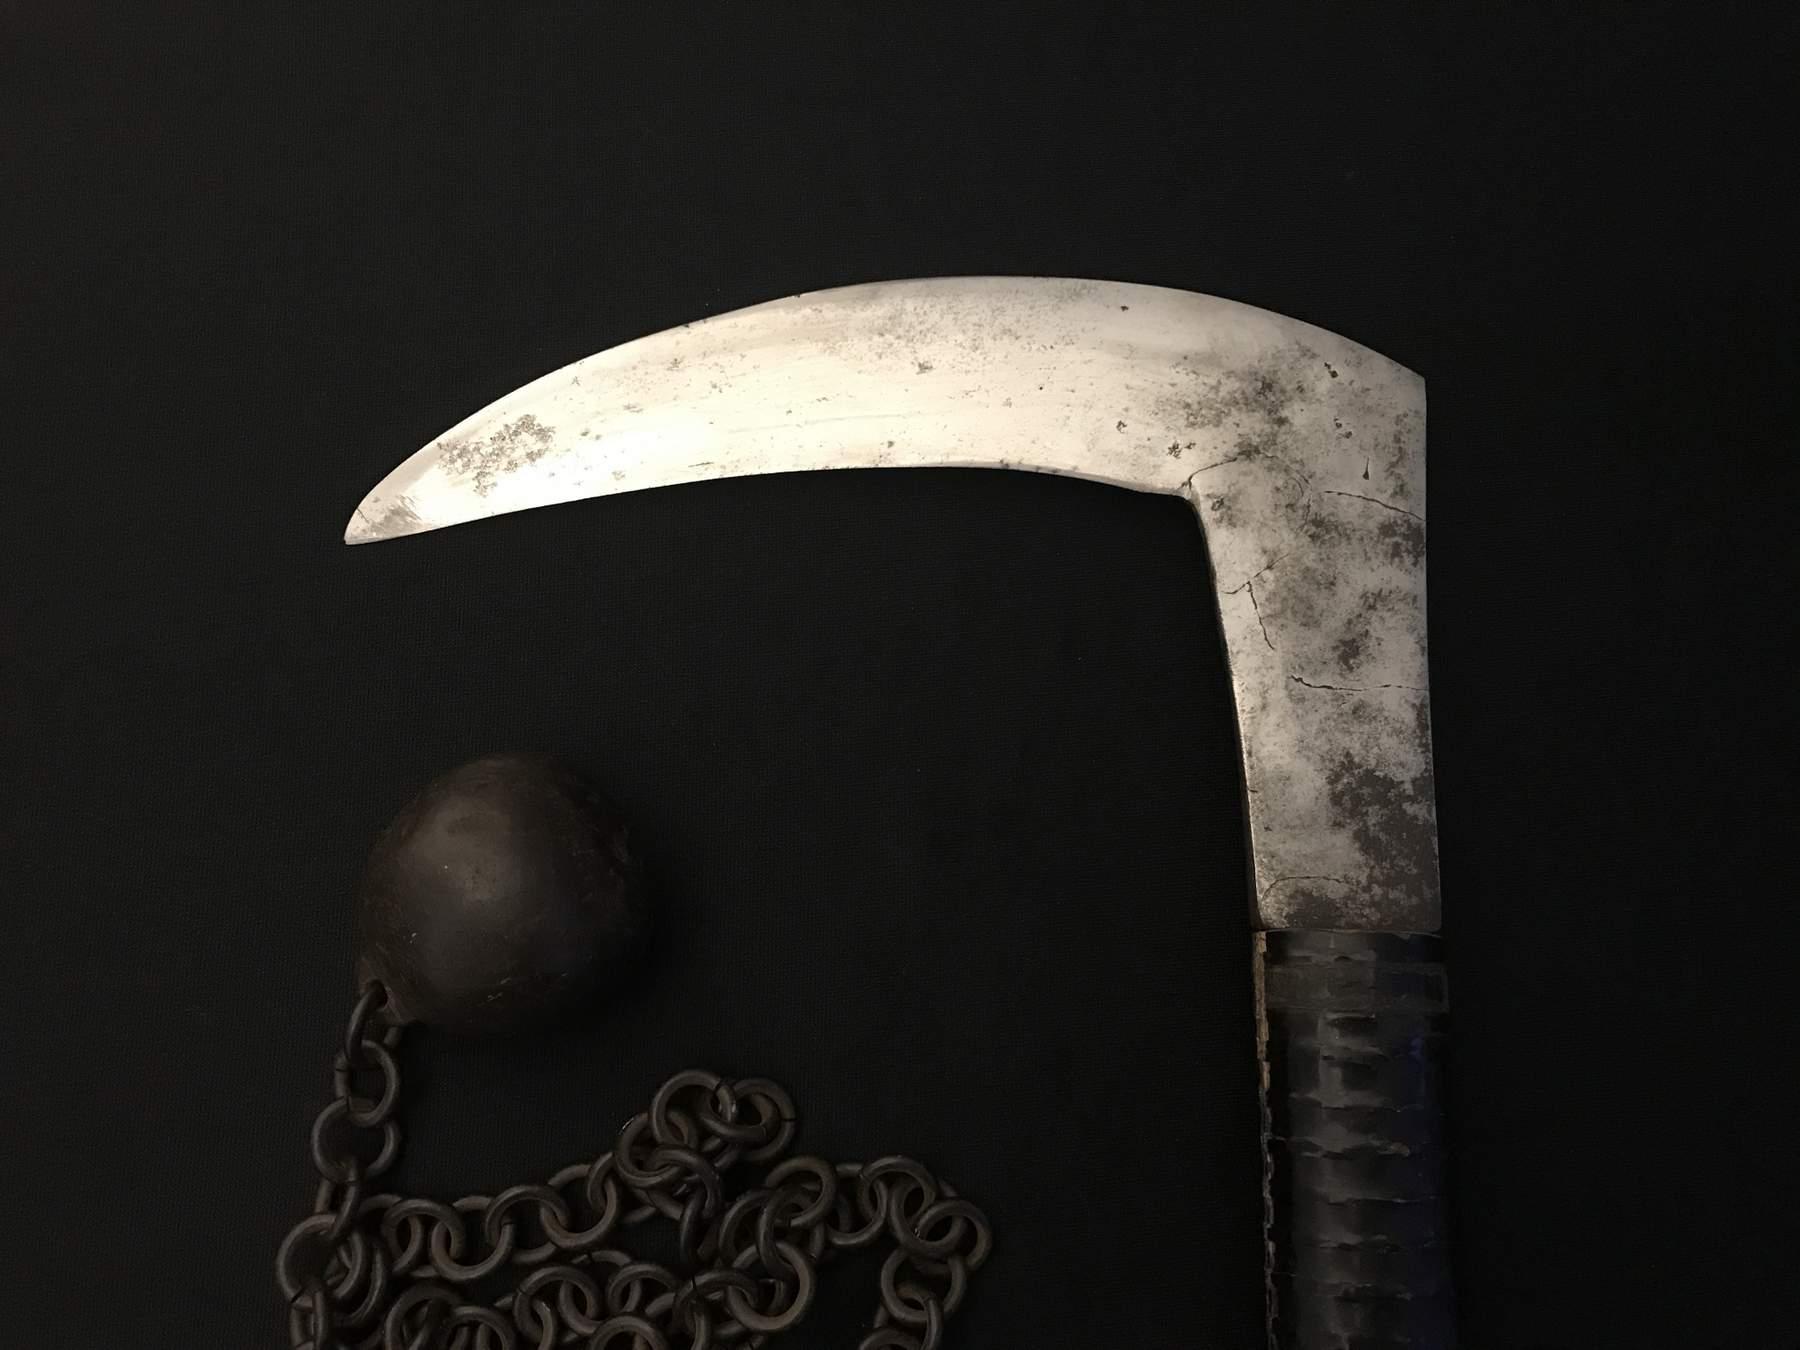 Antique Japanese Samurai Kusarigama Sickle & Chain -Old